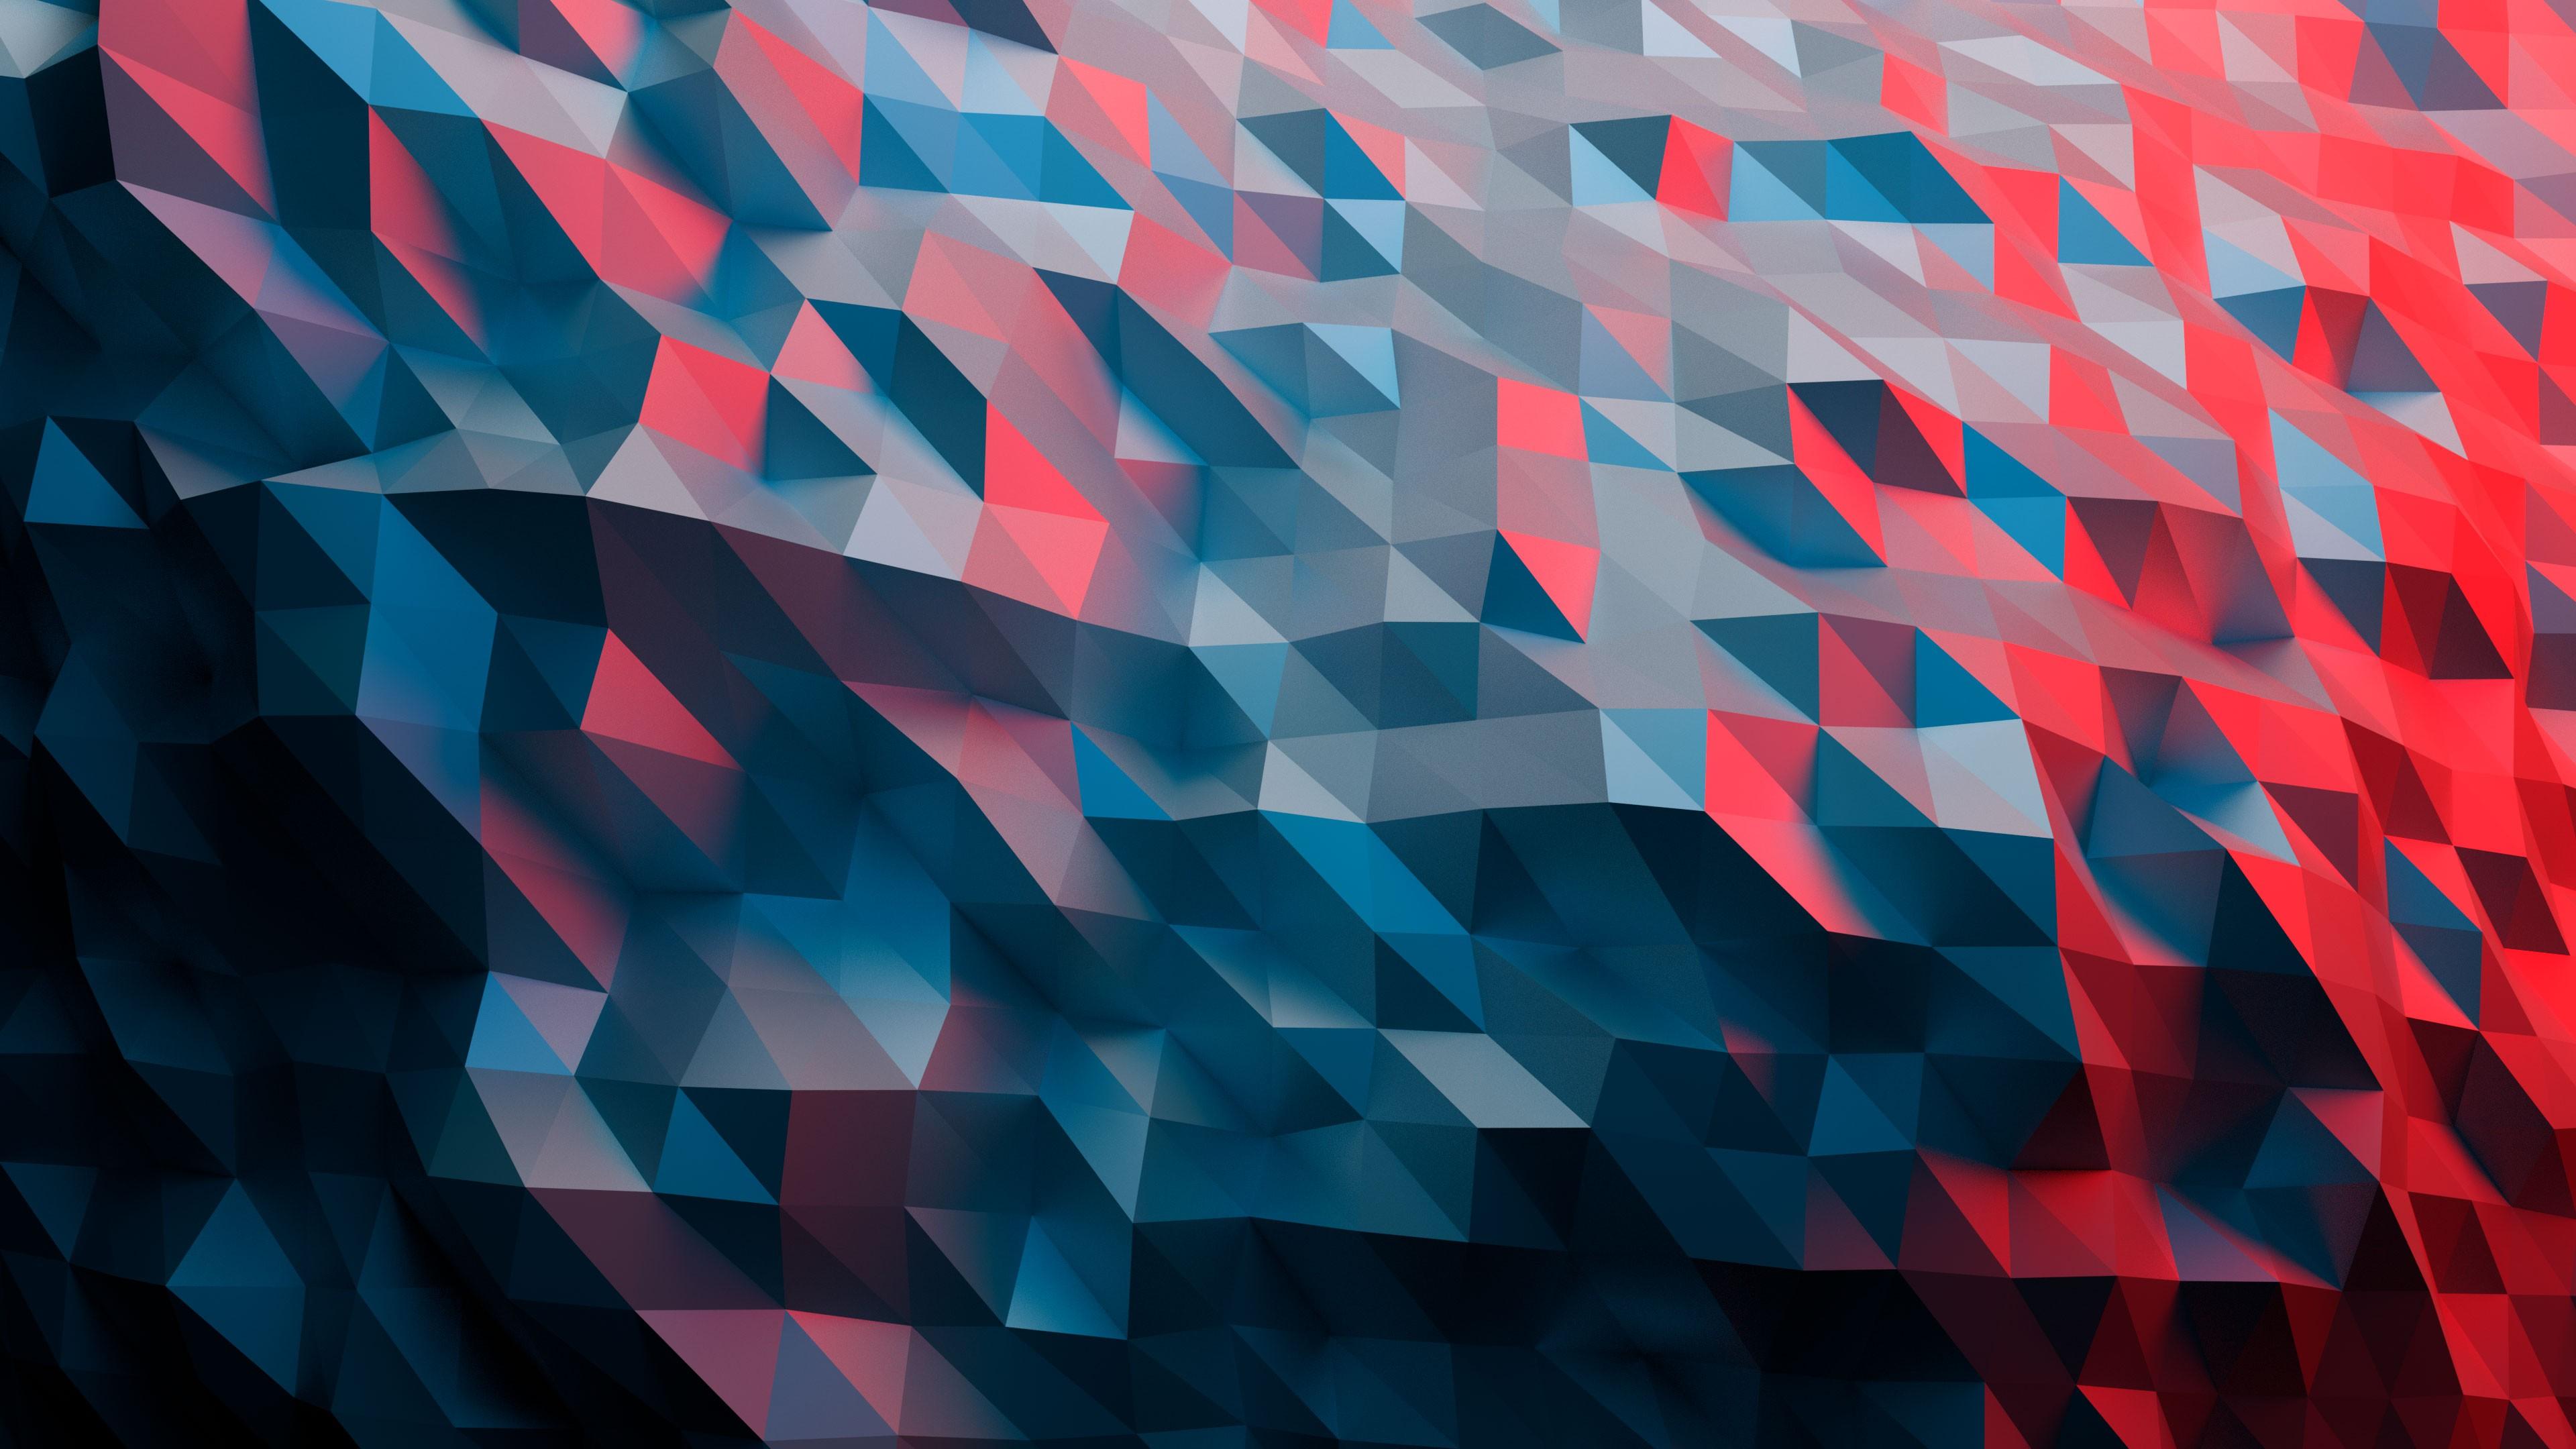 Wallpaper Polygon, 4k, Abstract #16202